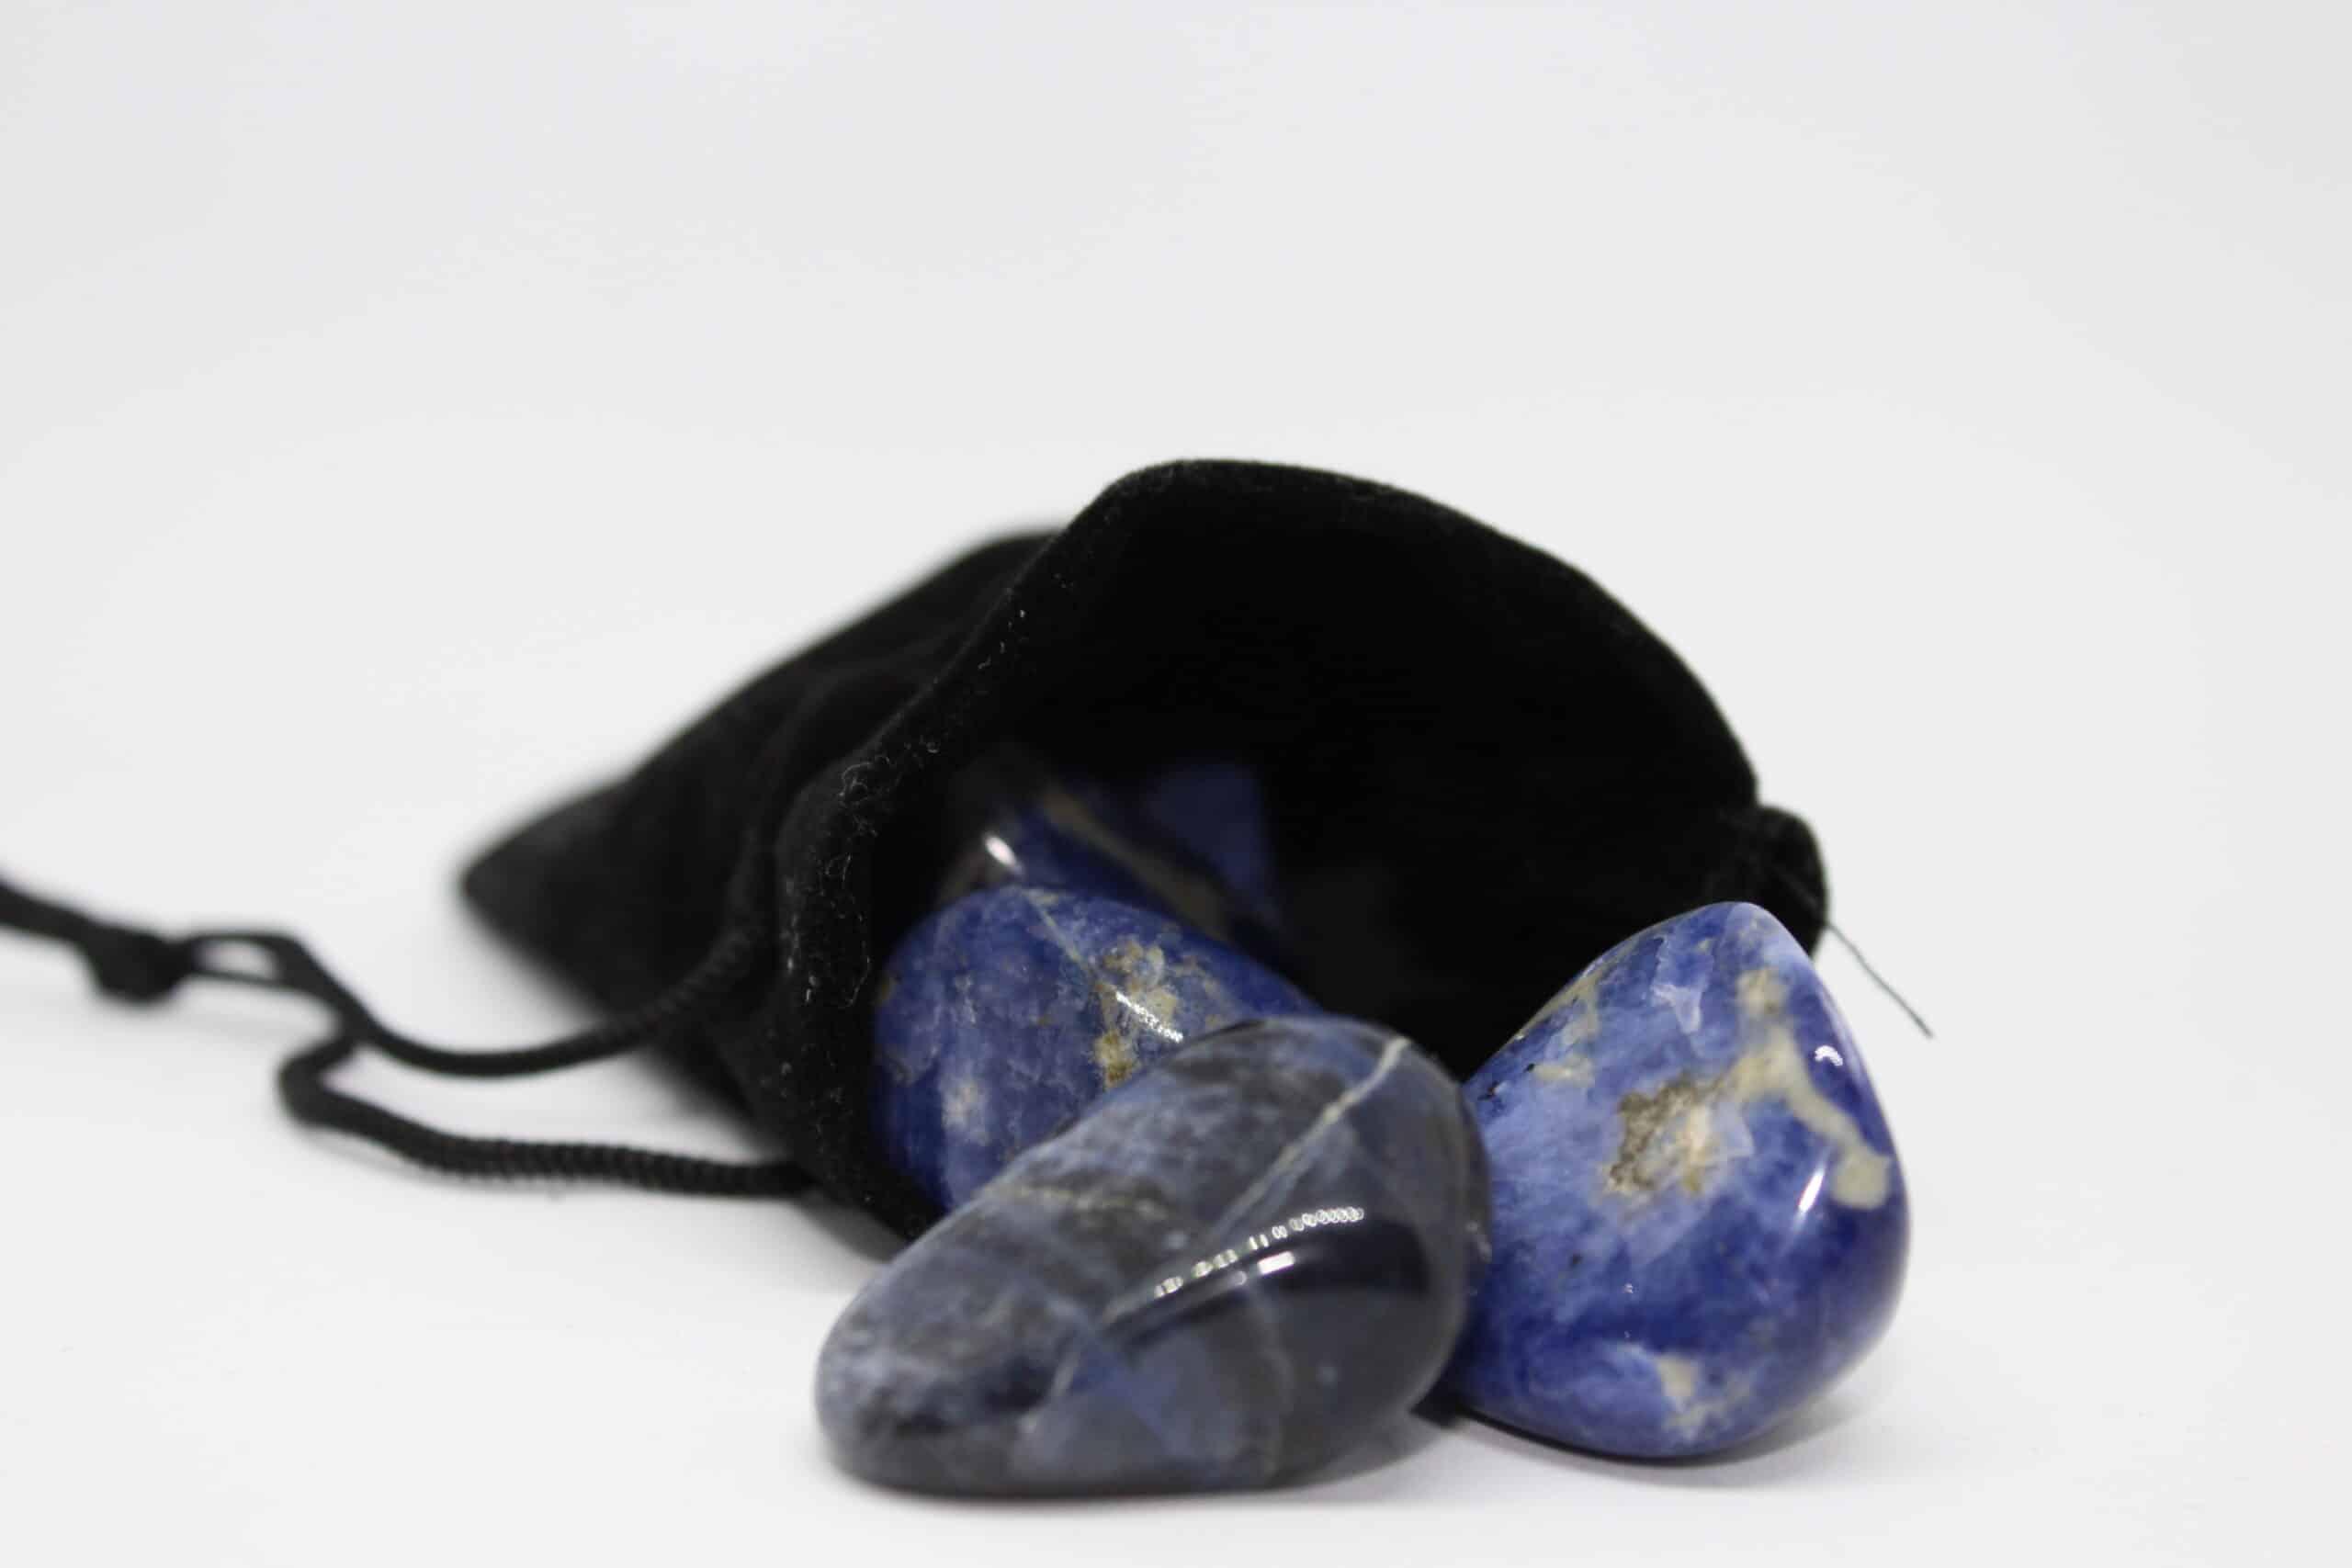 Bag of sodalite